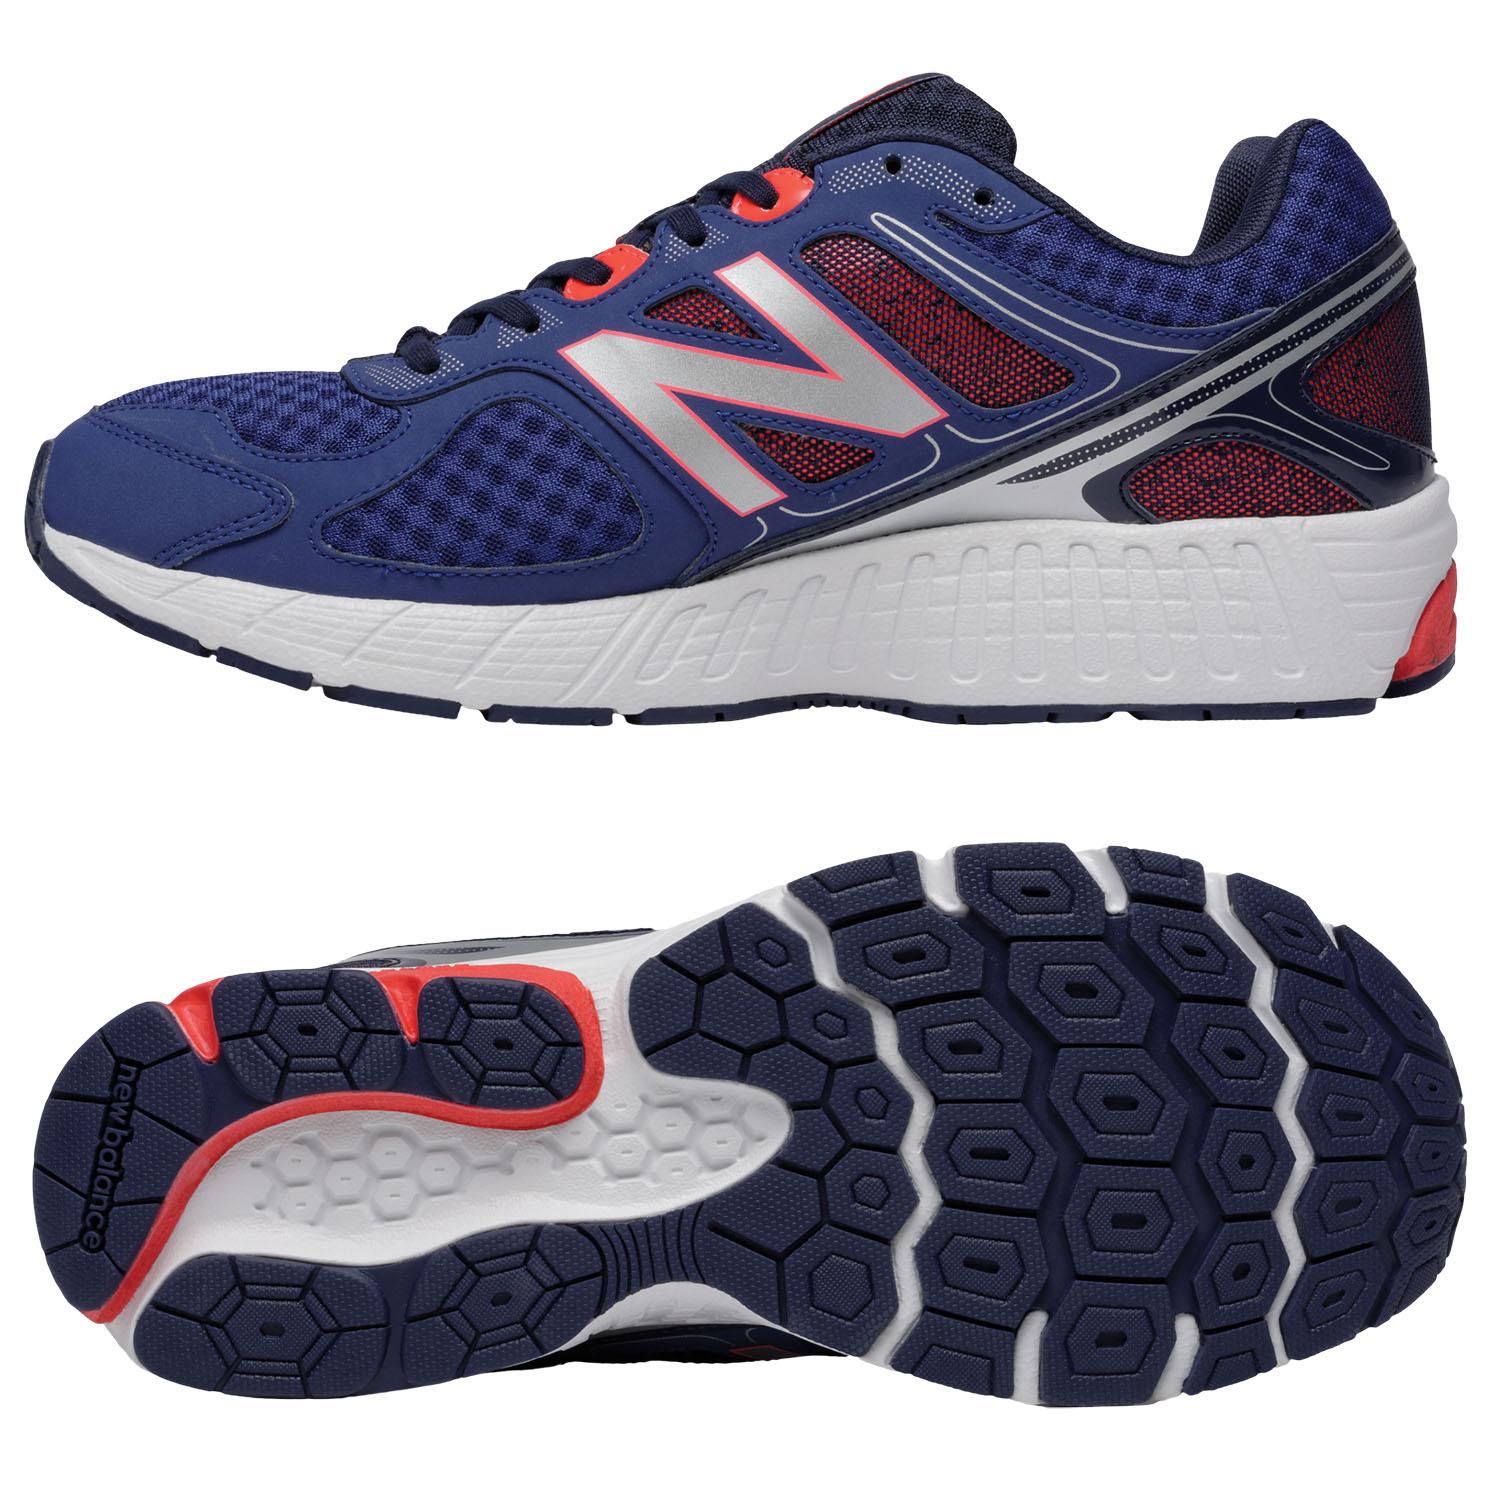 new balance 1080 v5 mens running shoes 9 uk